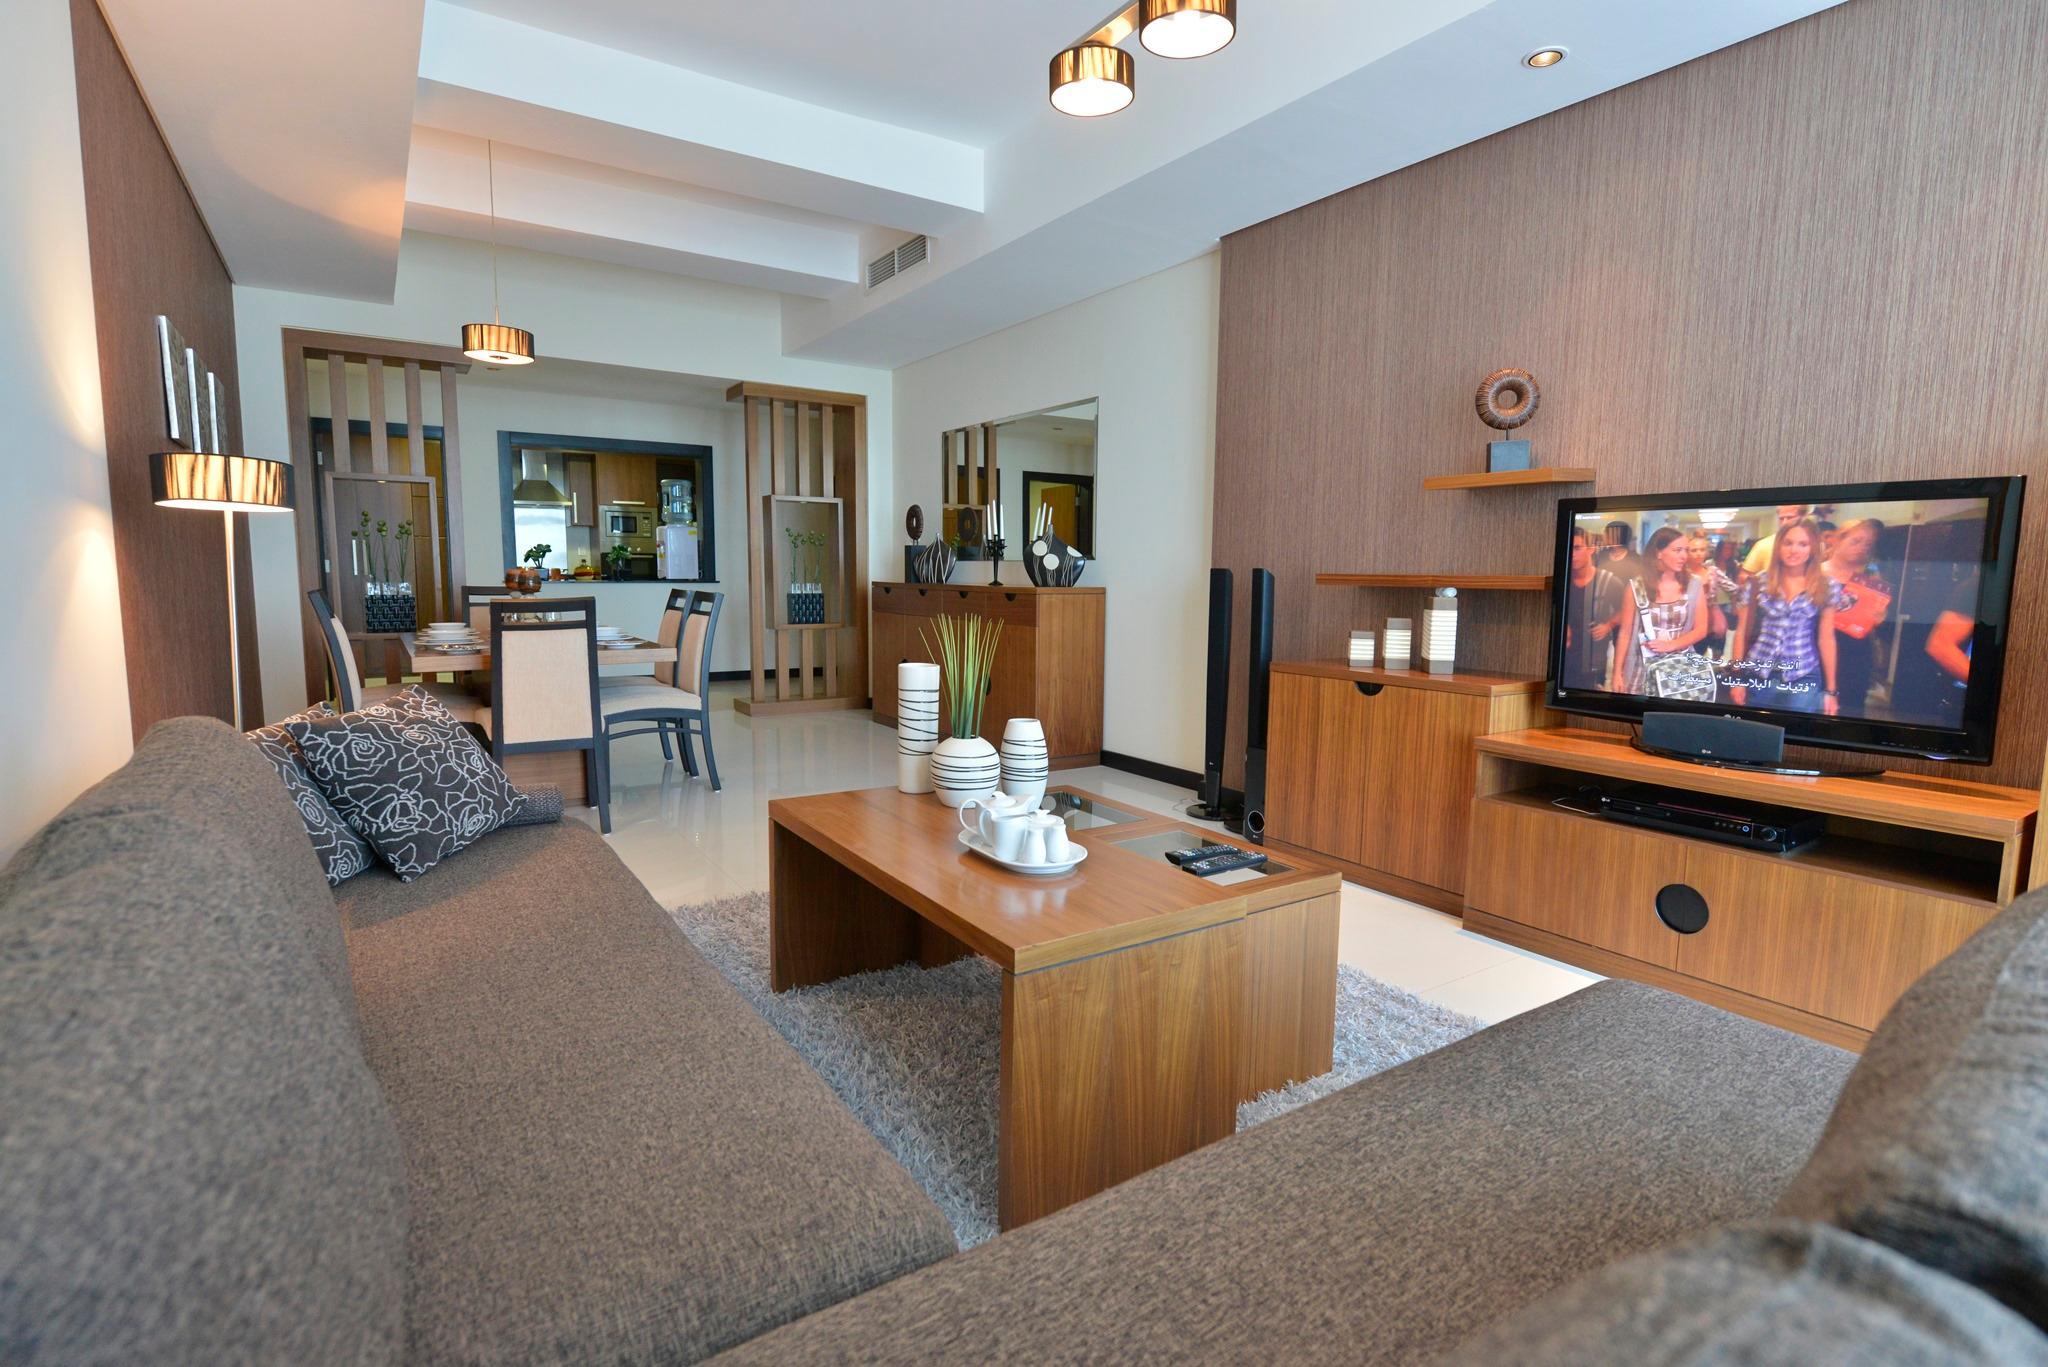 100 Residence   2 Bedroom Apartment  Lower Floor